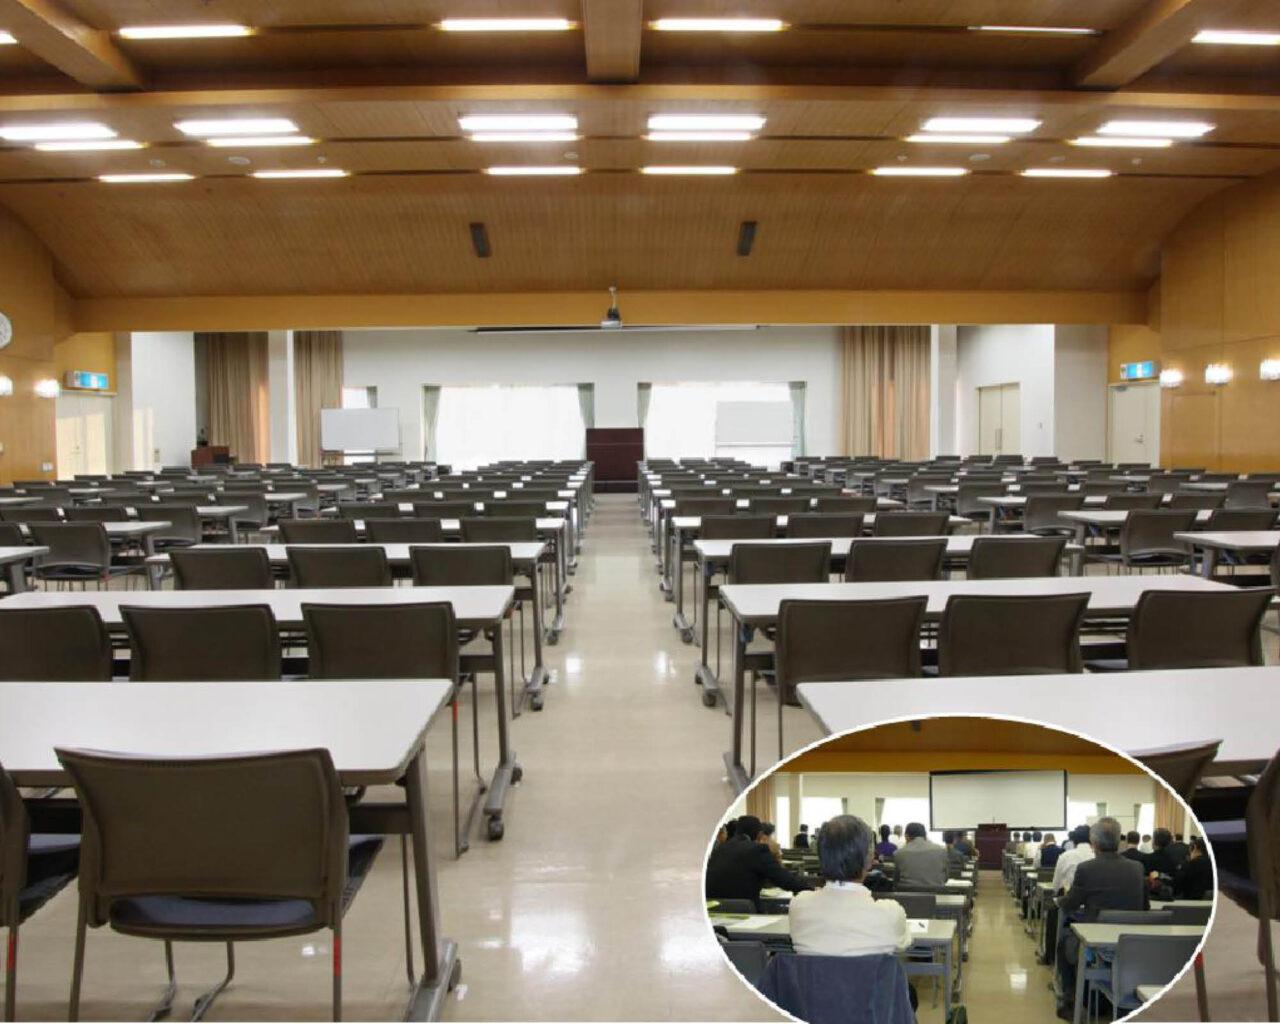 https://www.shizuoka-cb.com/wp-content/uploads/2021/02/photo-venues28-1280x1024.jpg